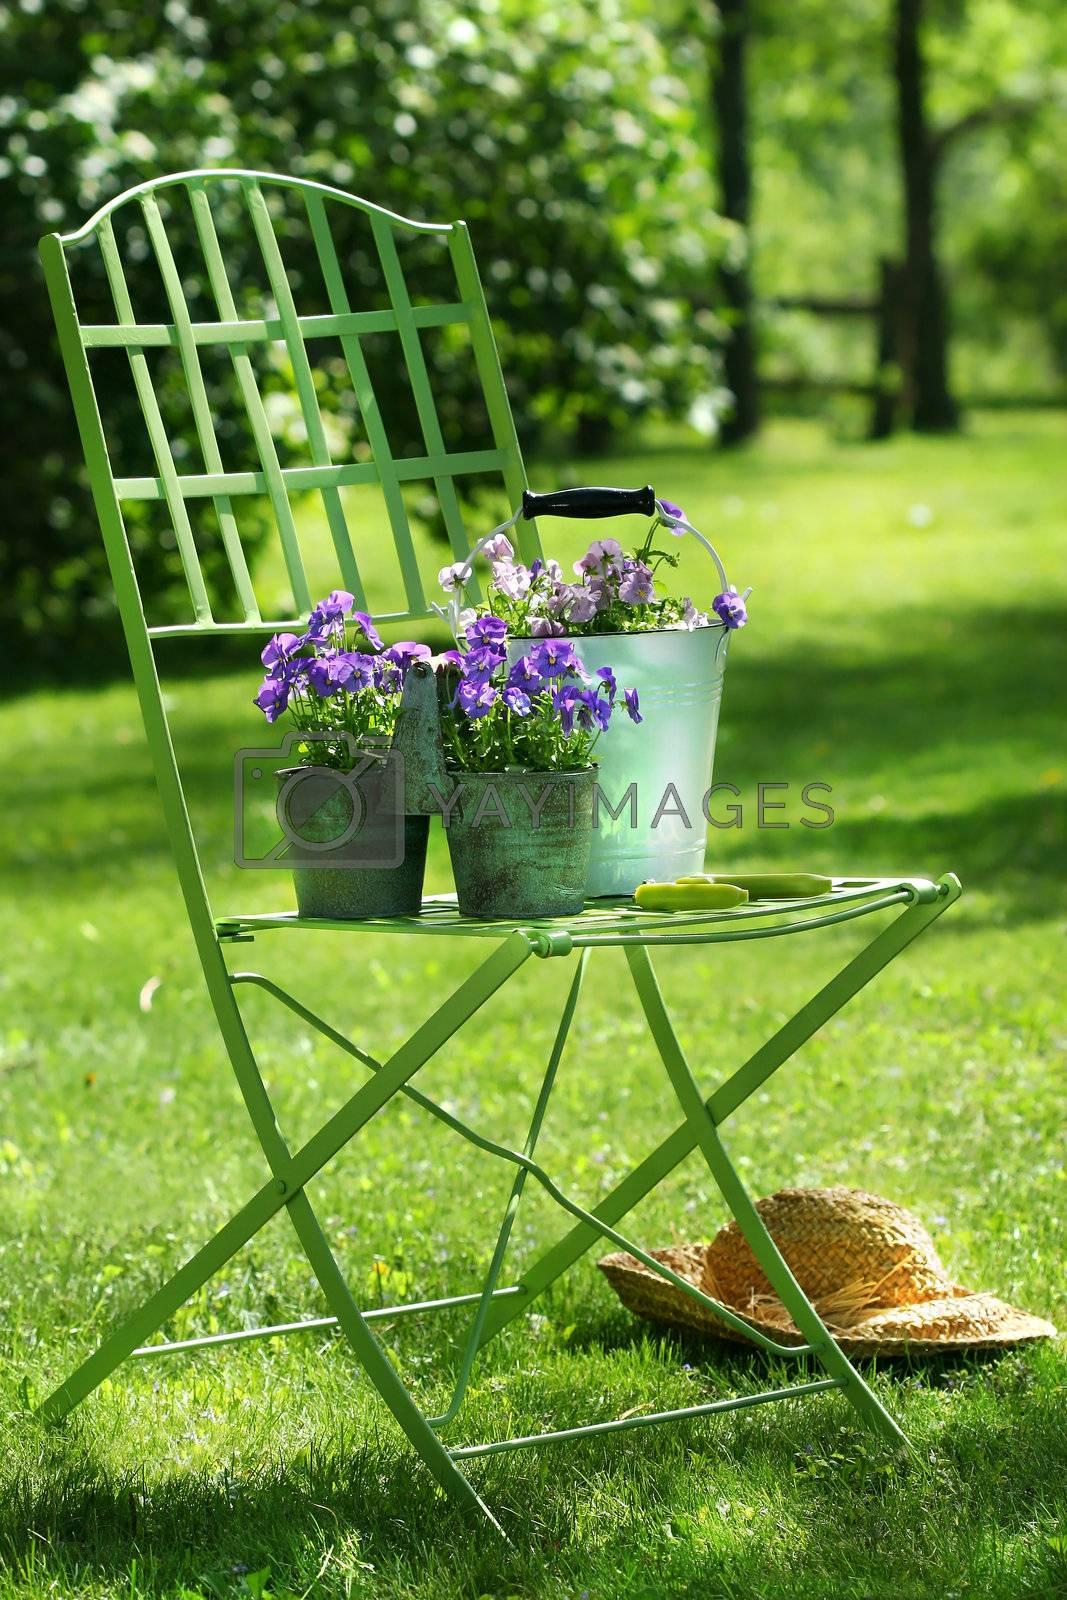 Green garden chair with straw hat